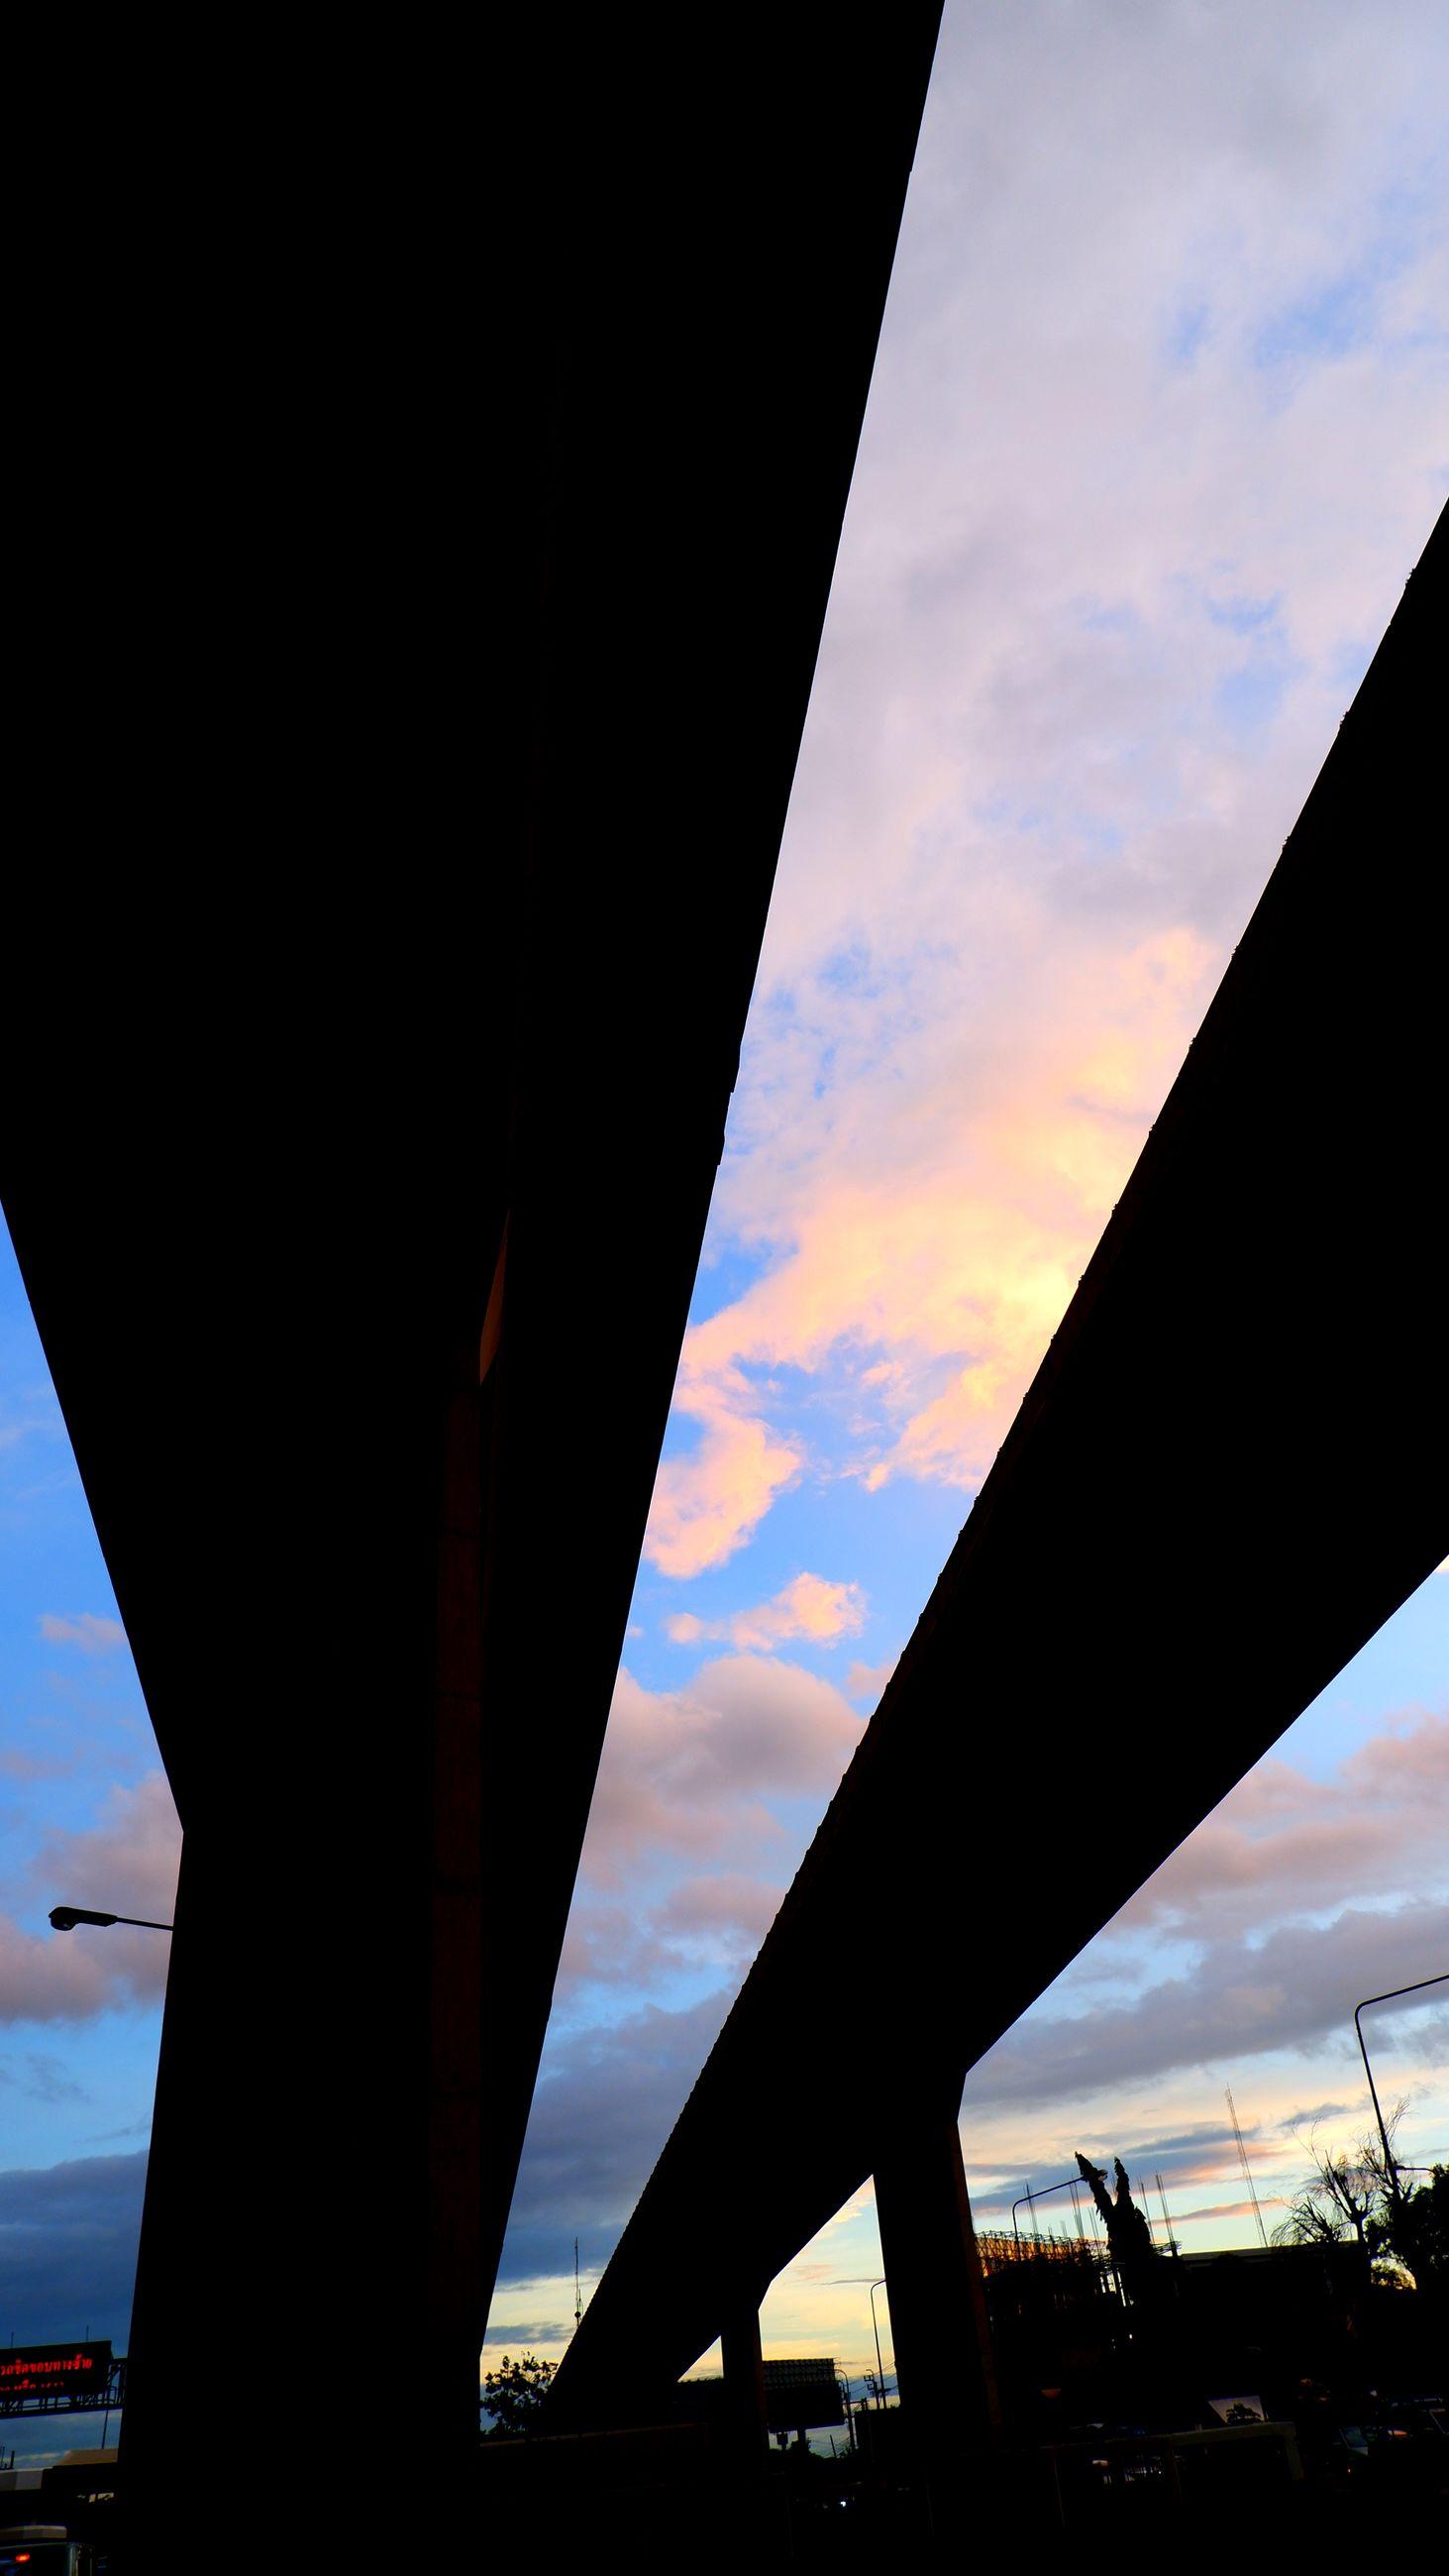 architecture, sky, transportation, built structure, sunset, bridge, silhouette, cloud, dusk, reflection, evening, nature, horizon, no people, sunlight, city, light, outdoors, road, mode of transportation, low angle view